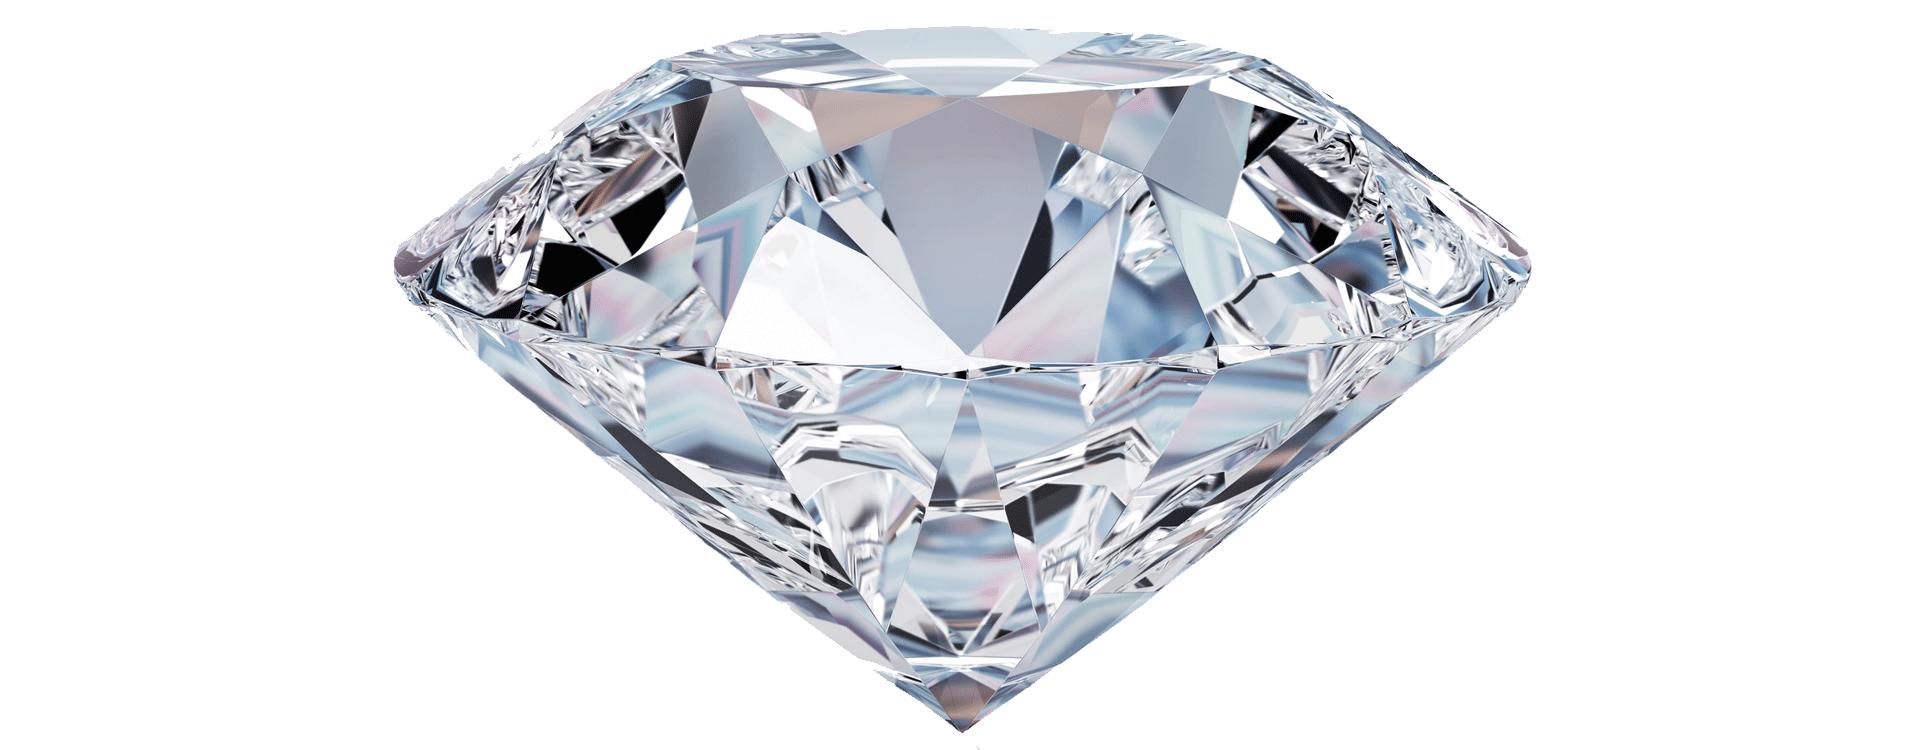 About Diamond Diamond Buyer San Diego La Mesa La Jolla